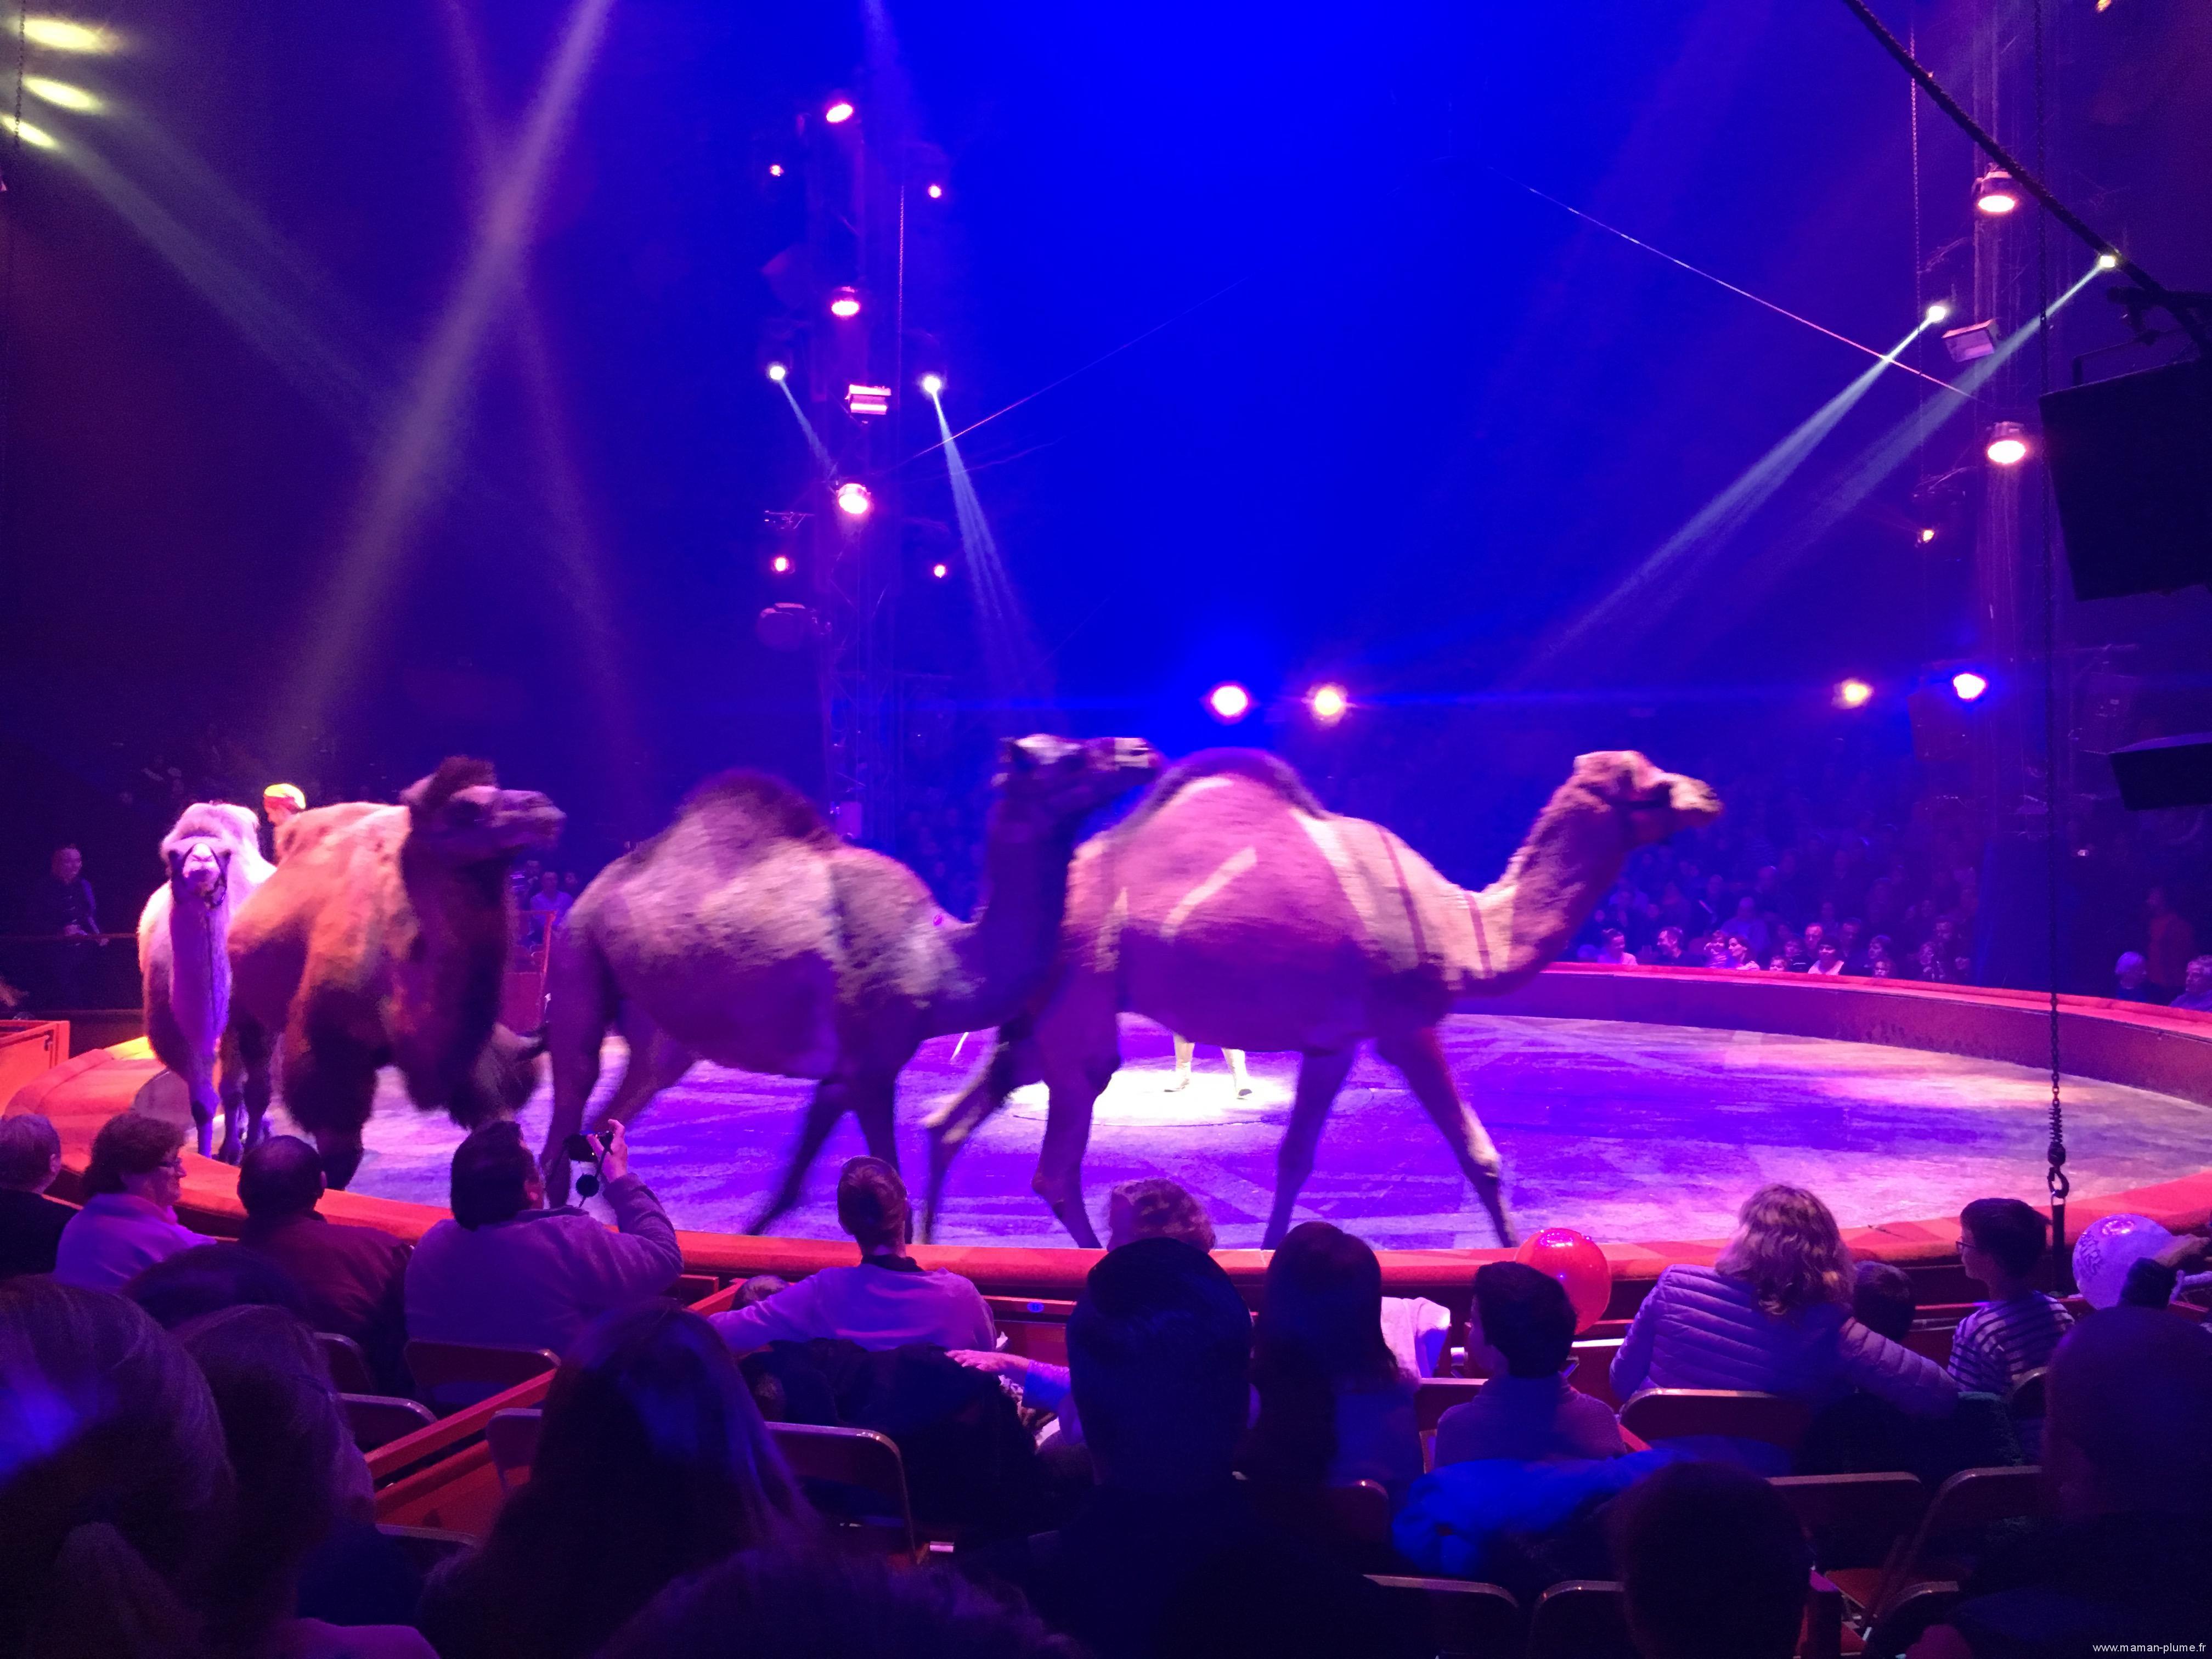 Notre sortie au Cirque Arlette Gruss